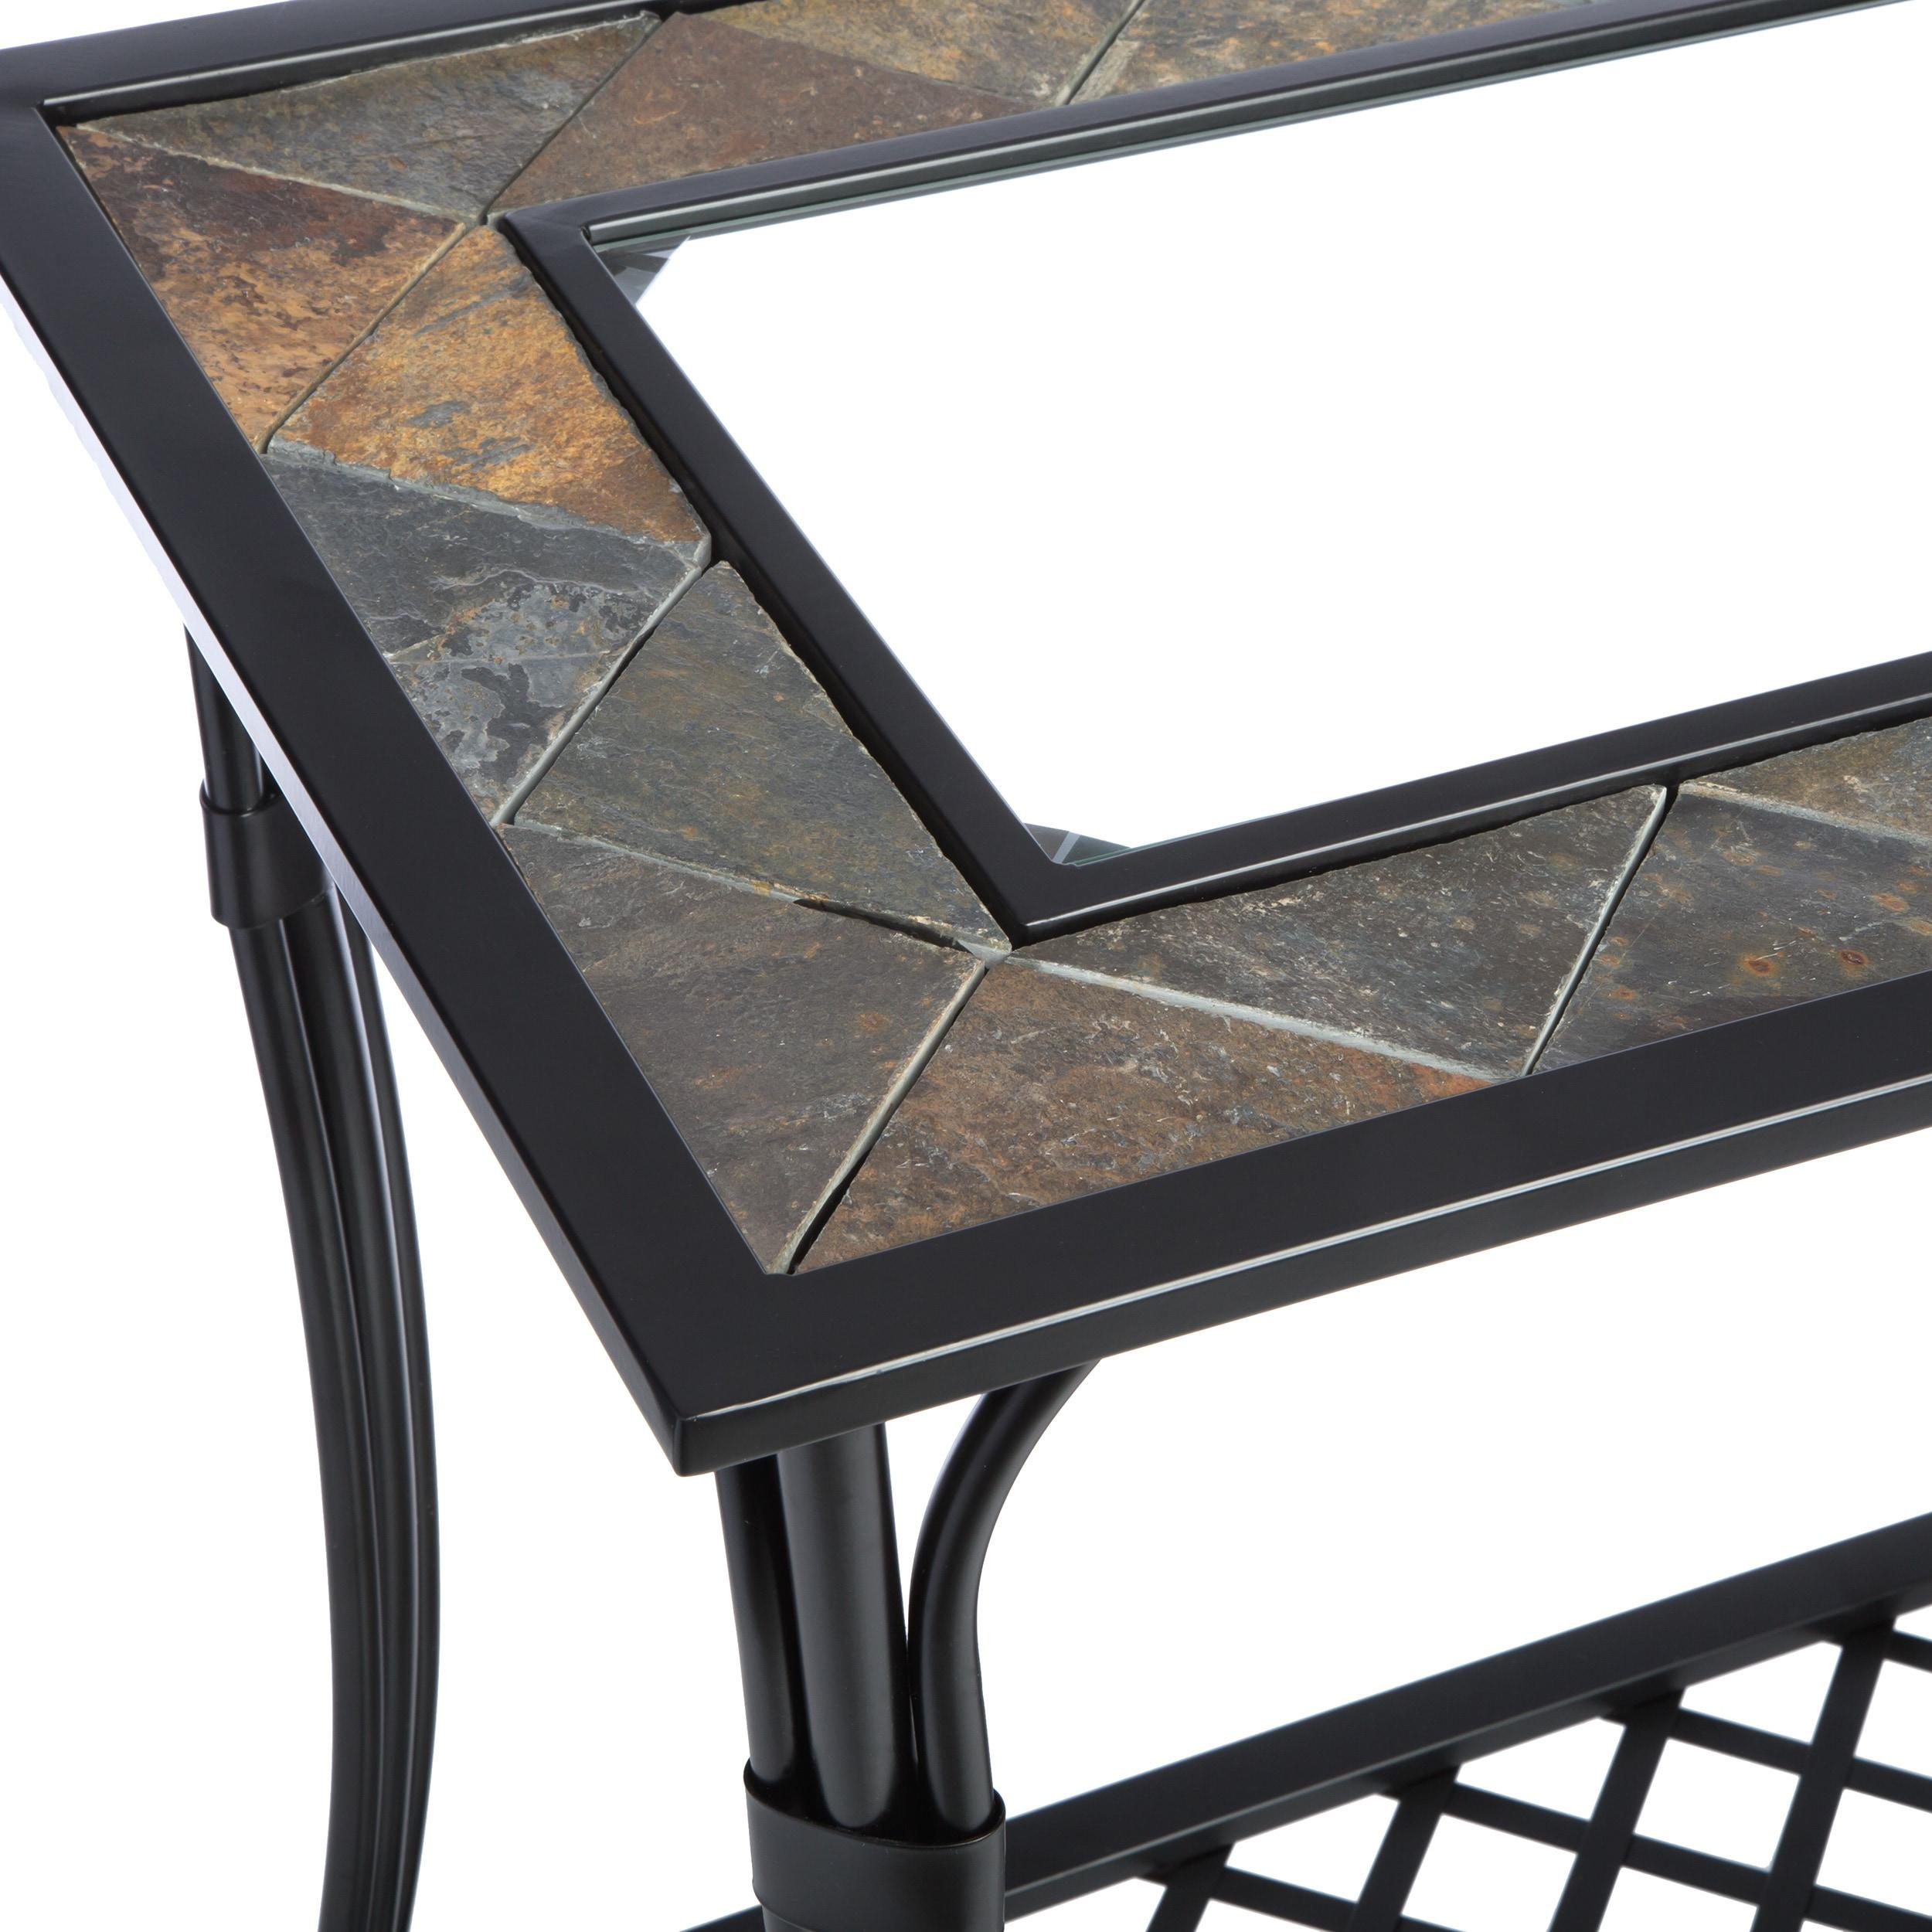 Copper grove slate glass steel sofa table free shipping today copper grove slate glass steel sofa table free shipping today overstock 11446690 watchthetrailerfo